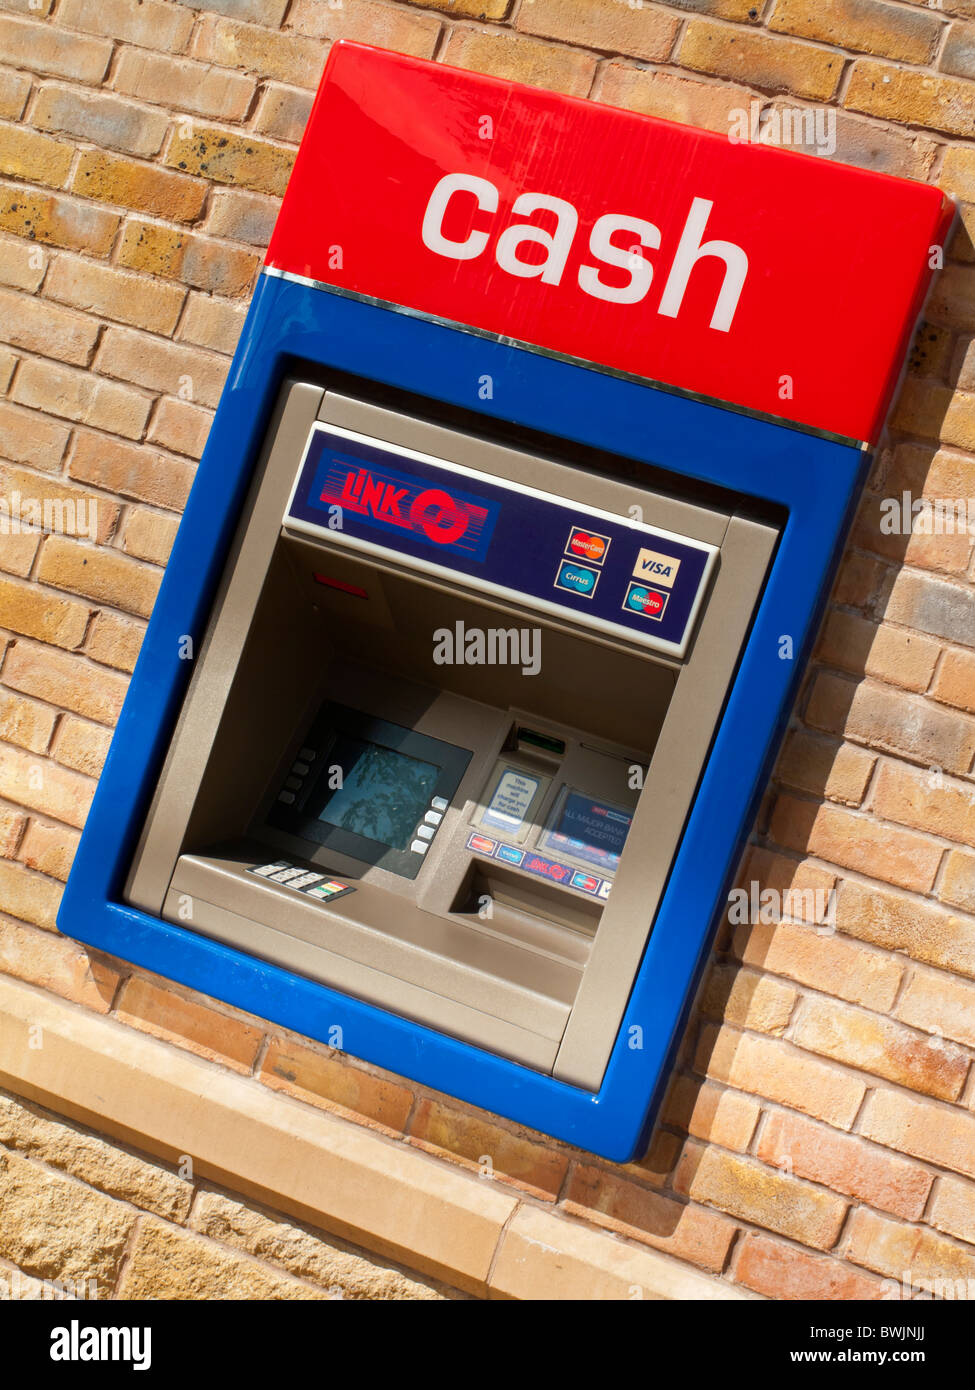 Cash Point Card